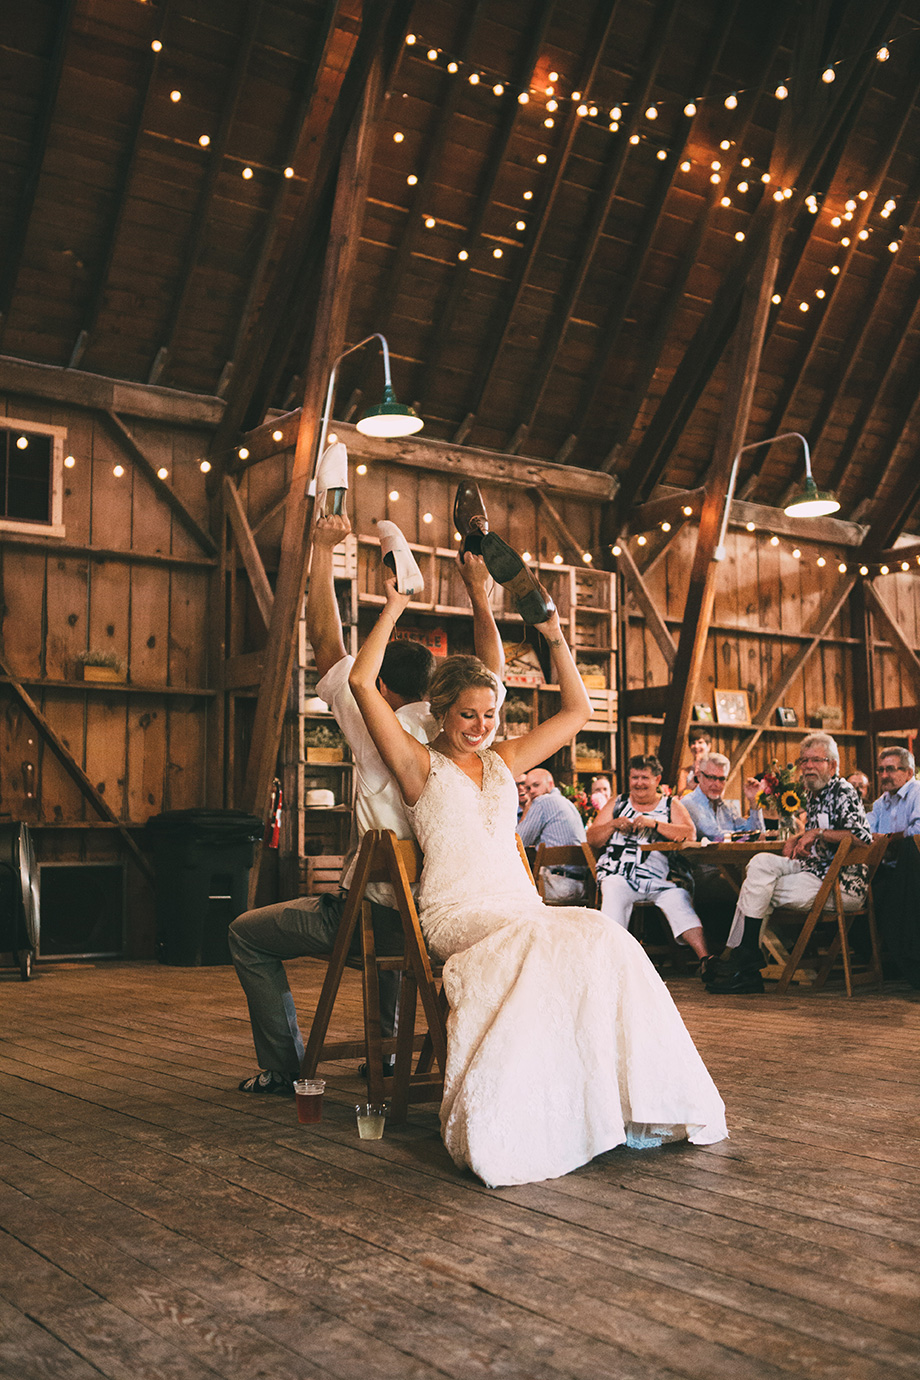 Dellwood Barn Weddings | Minnesota Bride